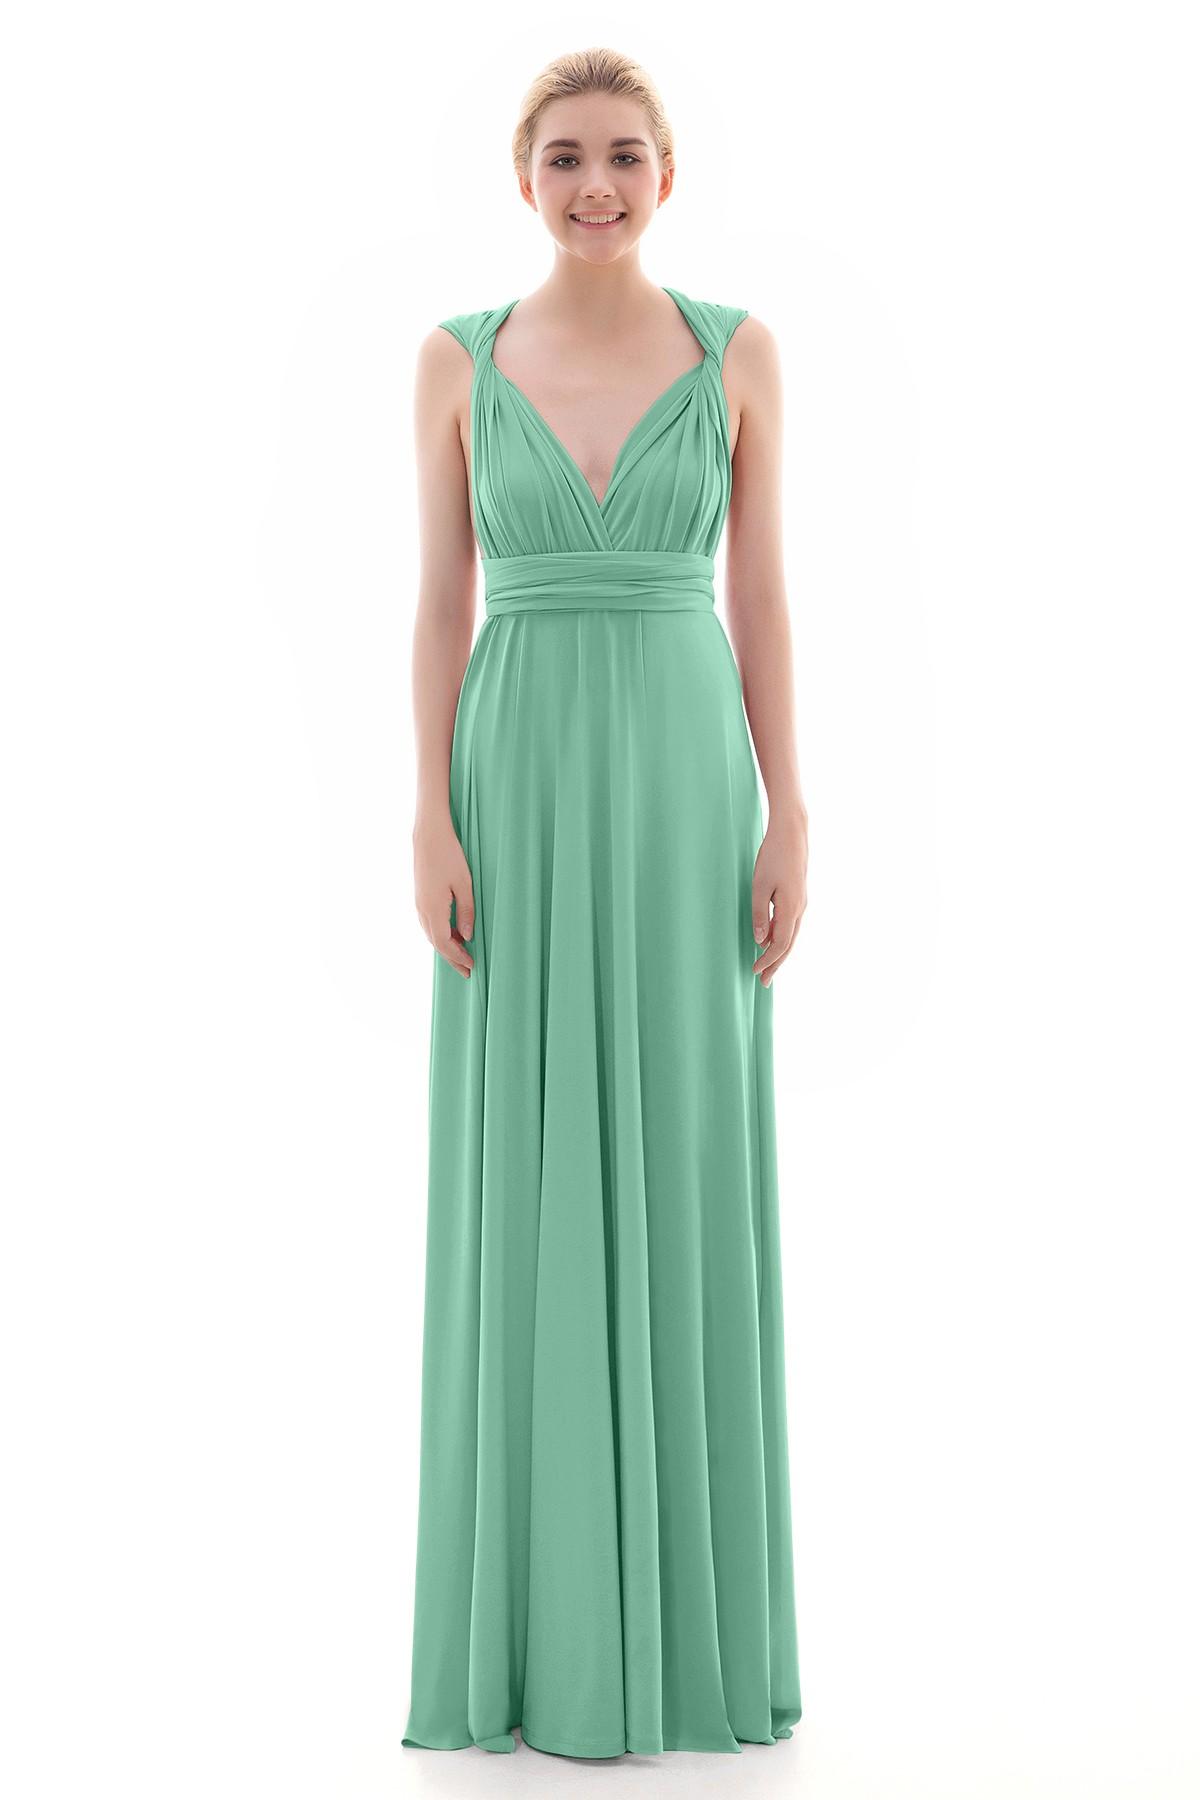 92225356d3c Sheath-Column Floor Length Knitted Fabric Dress COEF16001